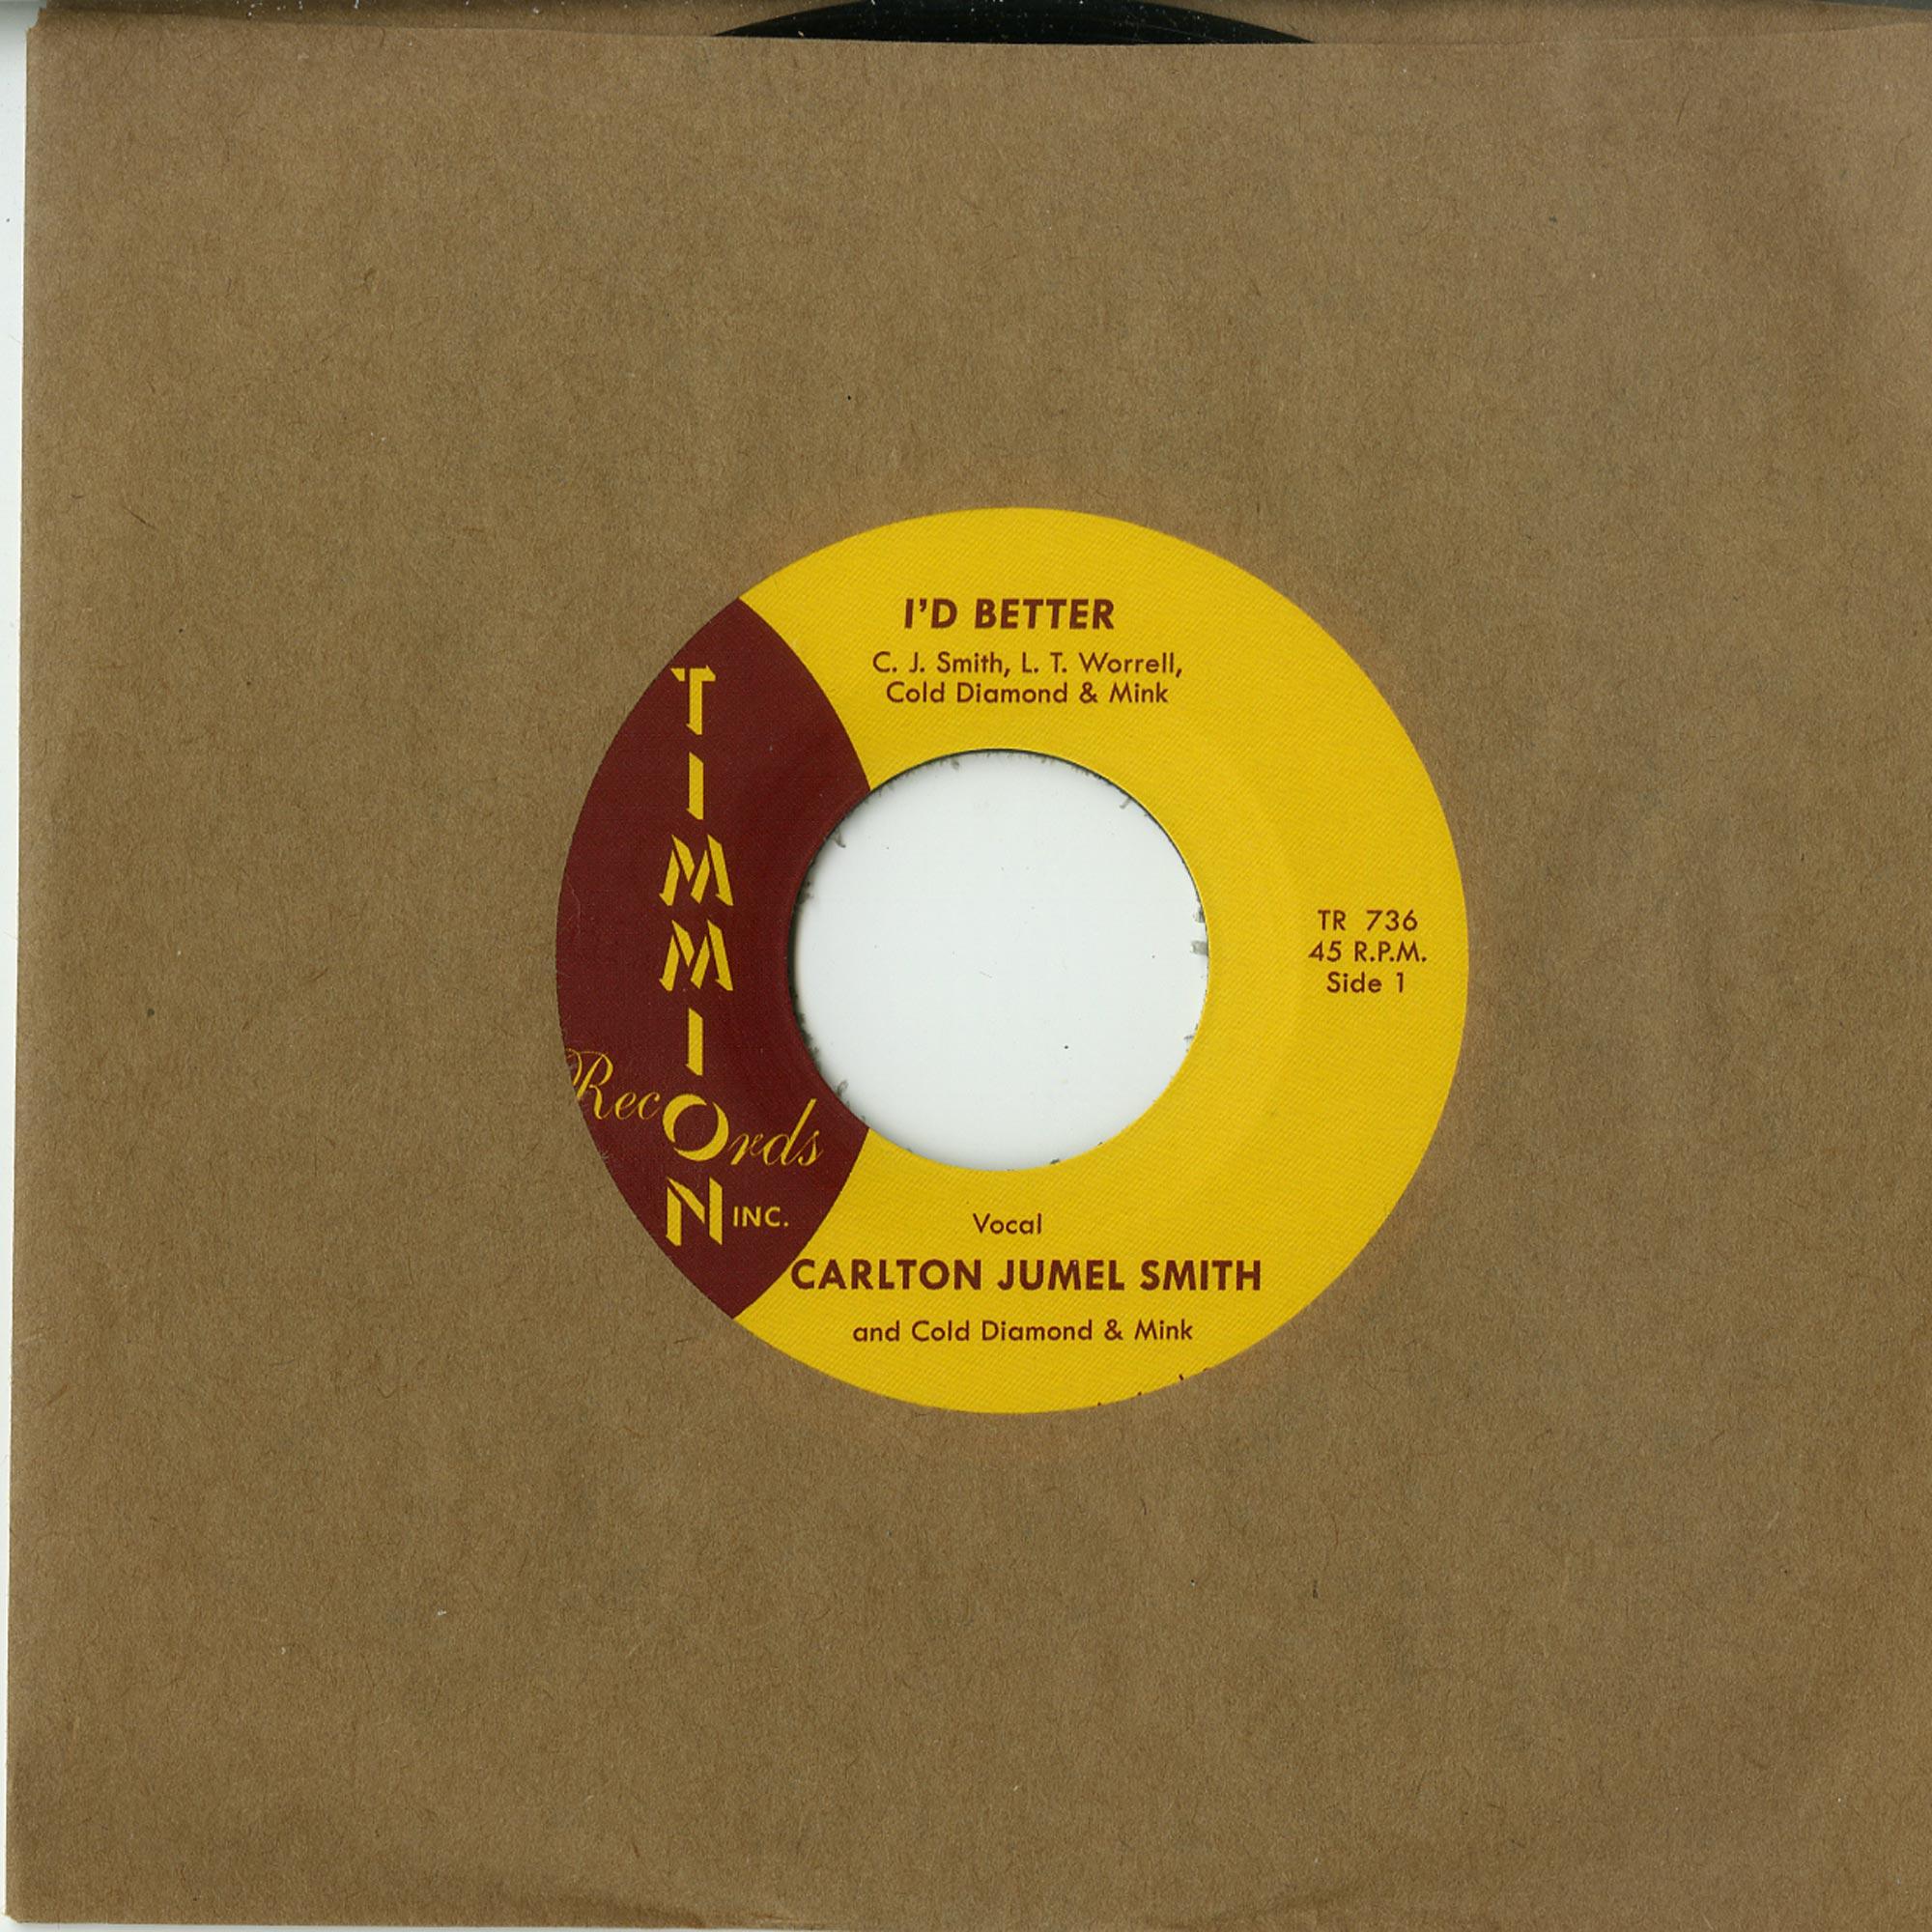 Carlton Jumel Smith & Cold Diamond & Mink - I D BETTER